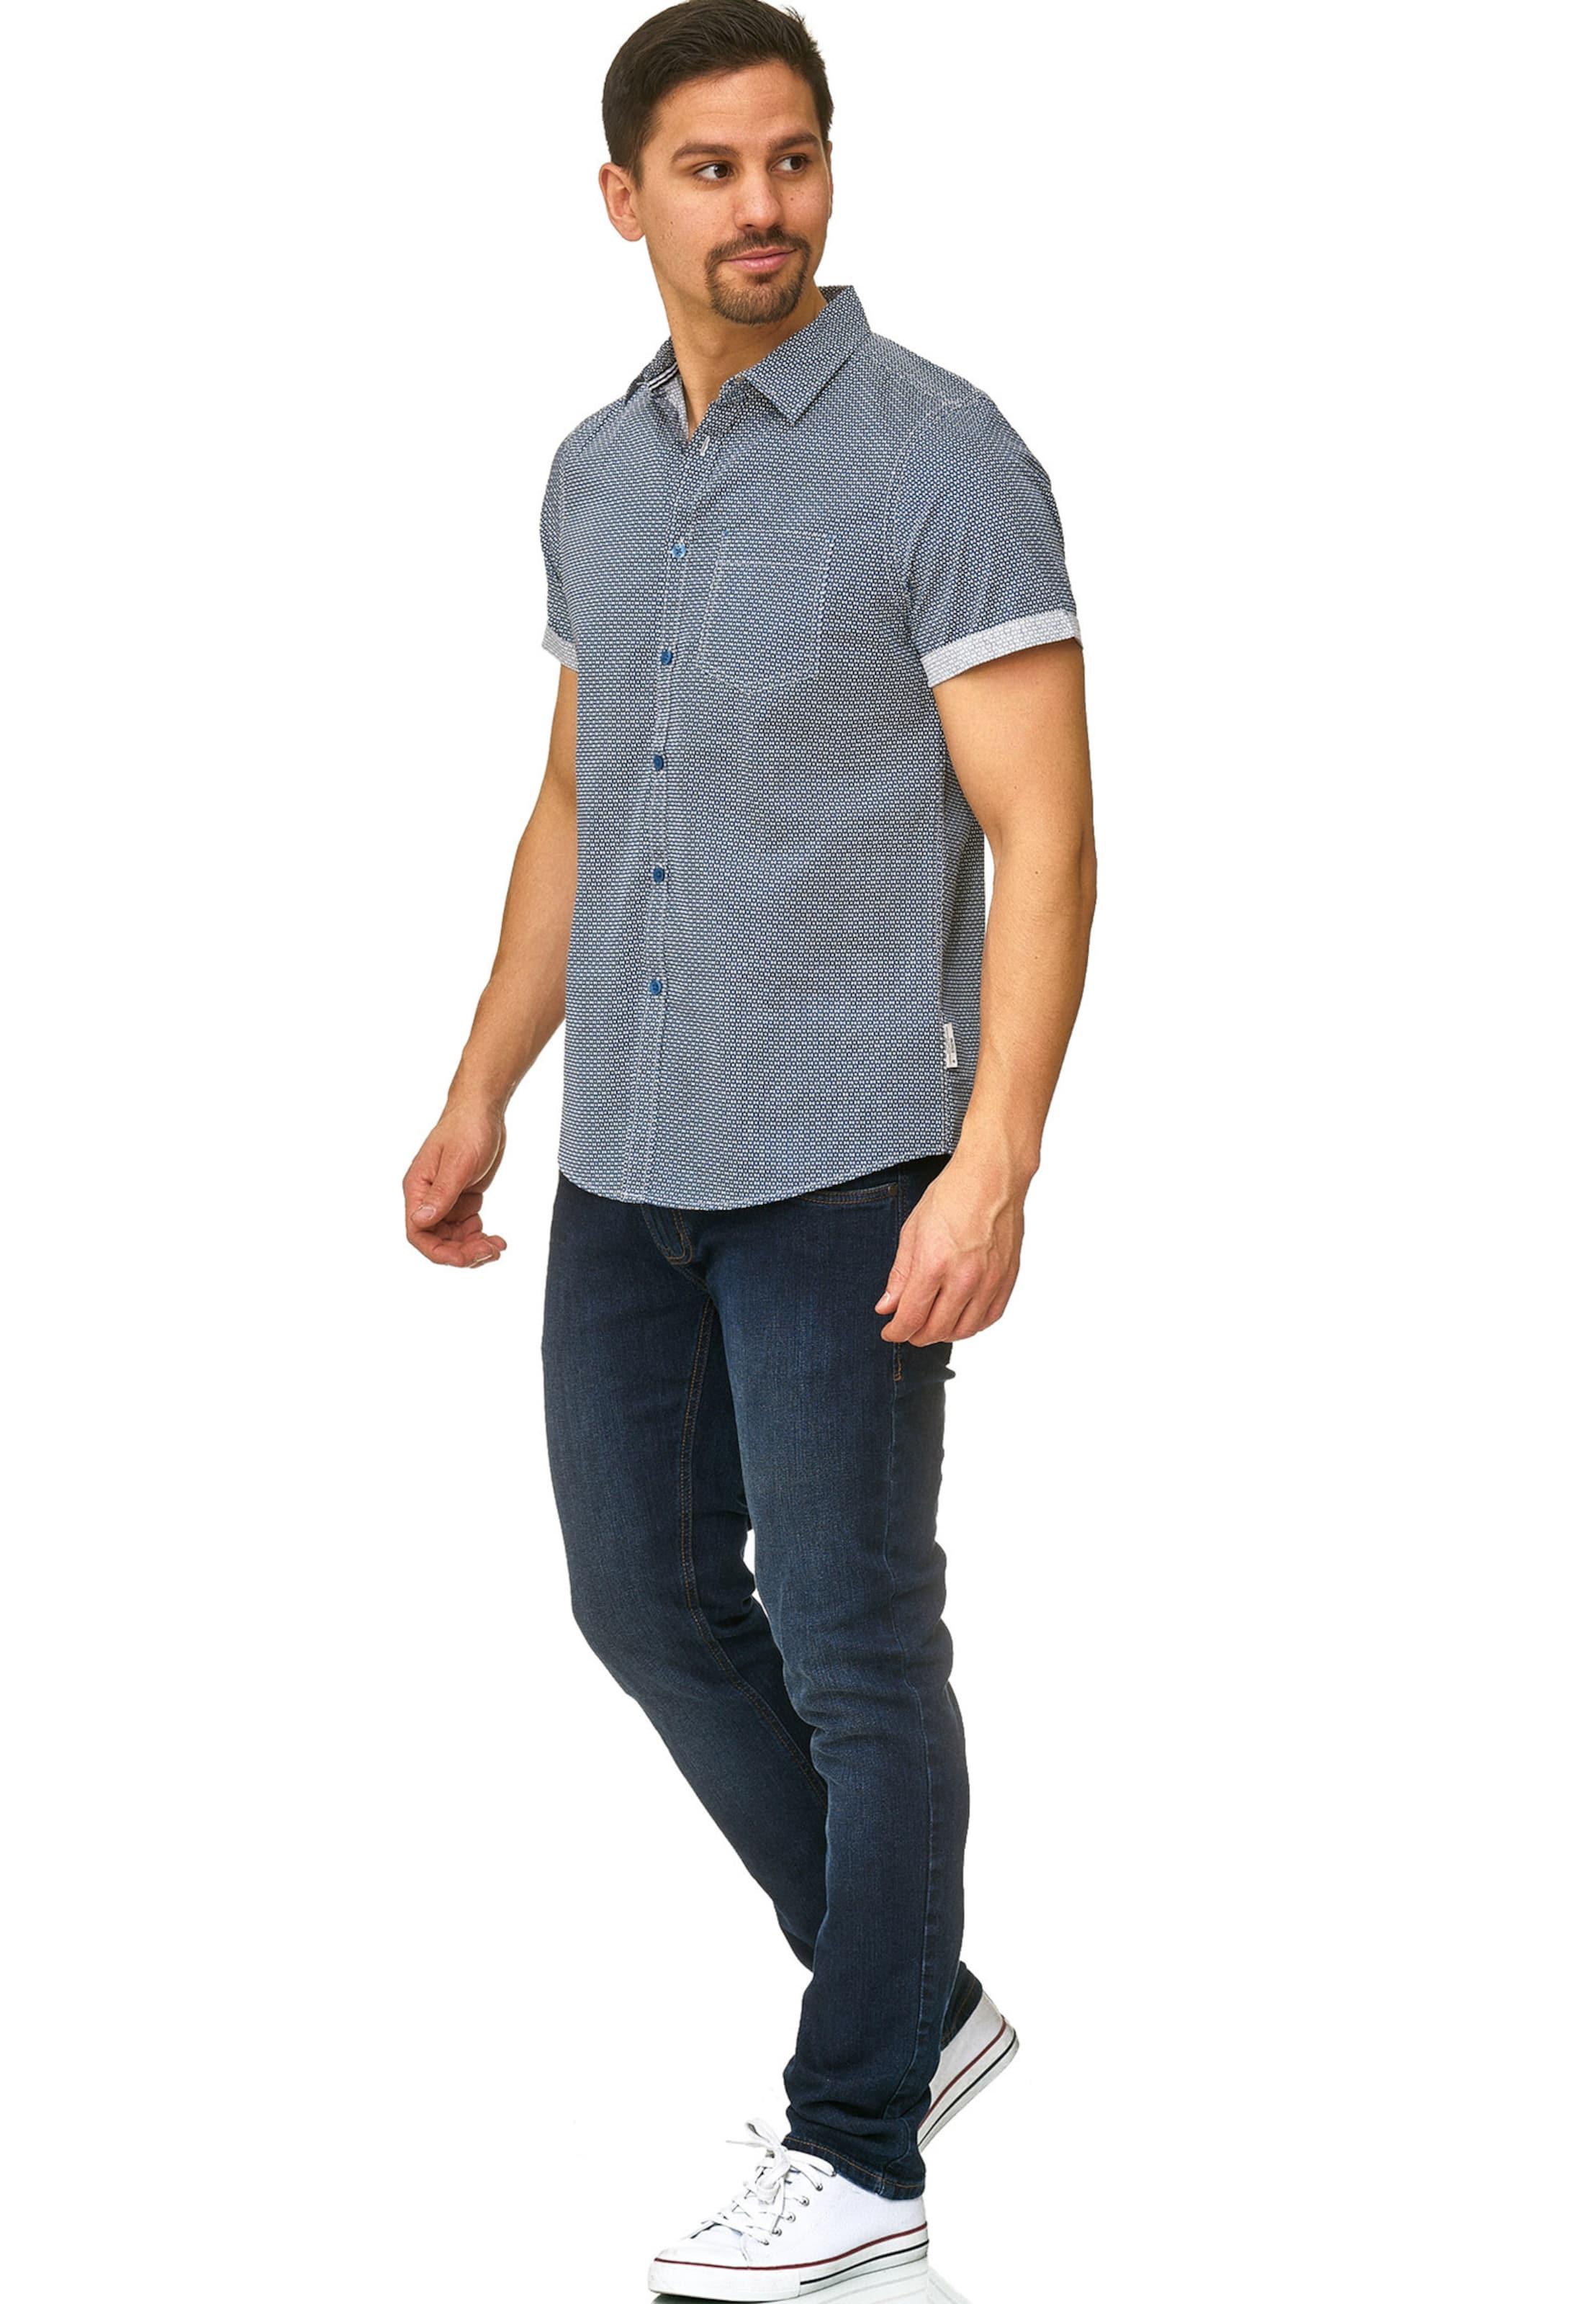 Jeans Hemd In BlauWeiß Indicode 'christchurch' n0kXO8wP